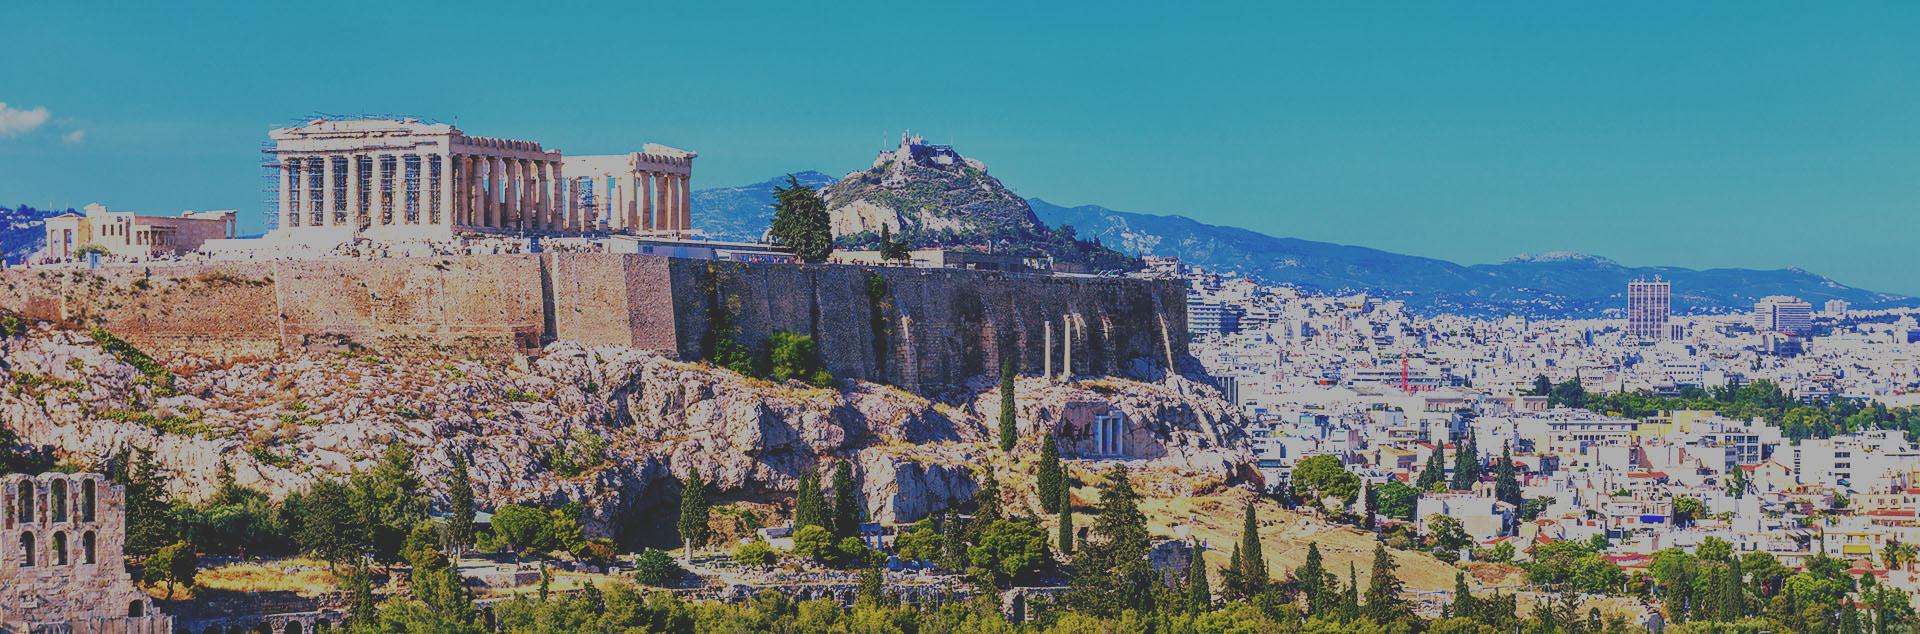 GreeceHeroImage-1